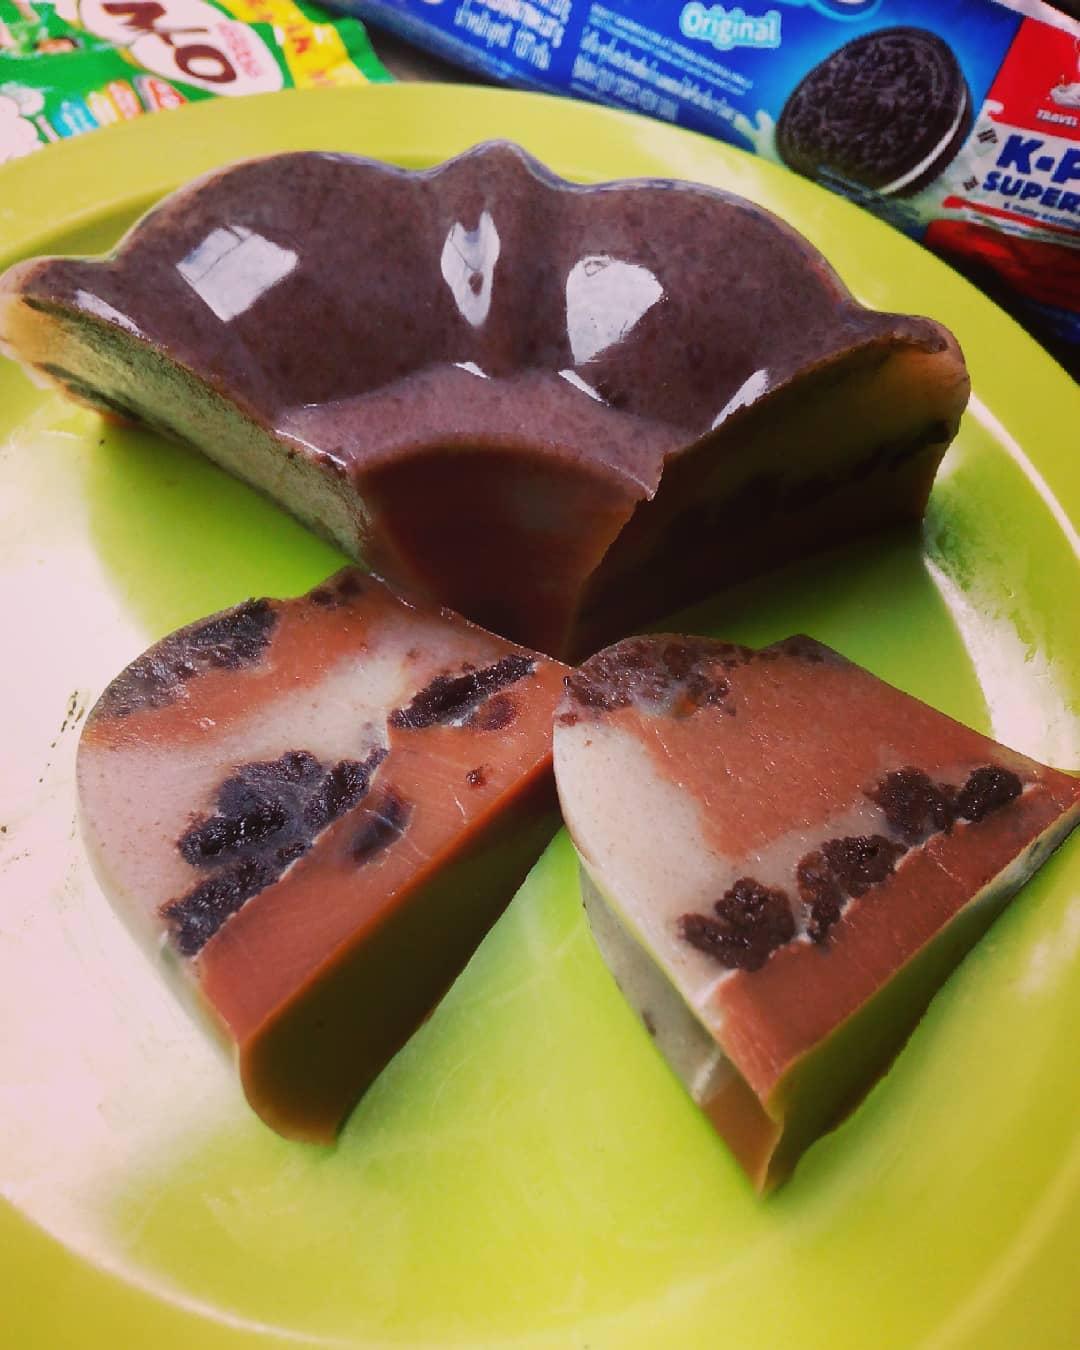 Resep Puding Oreo Coklat Milo